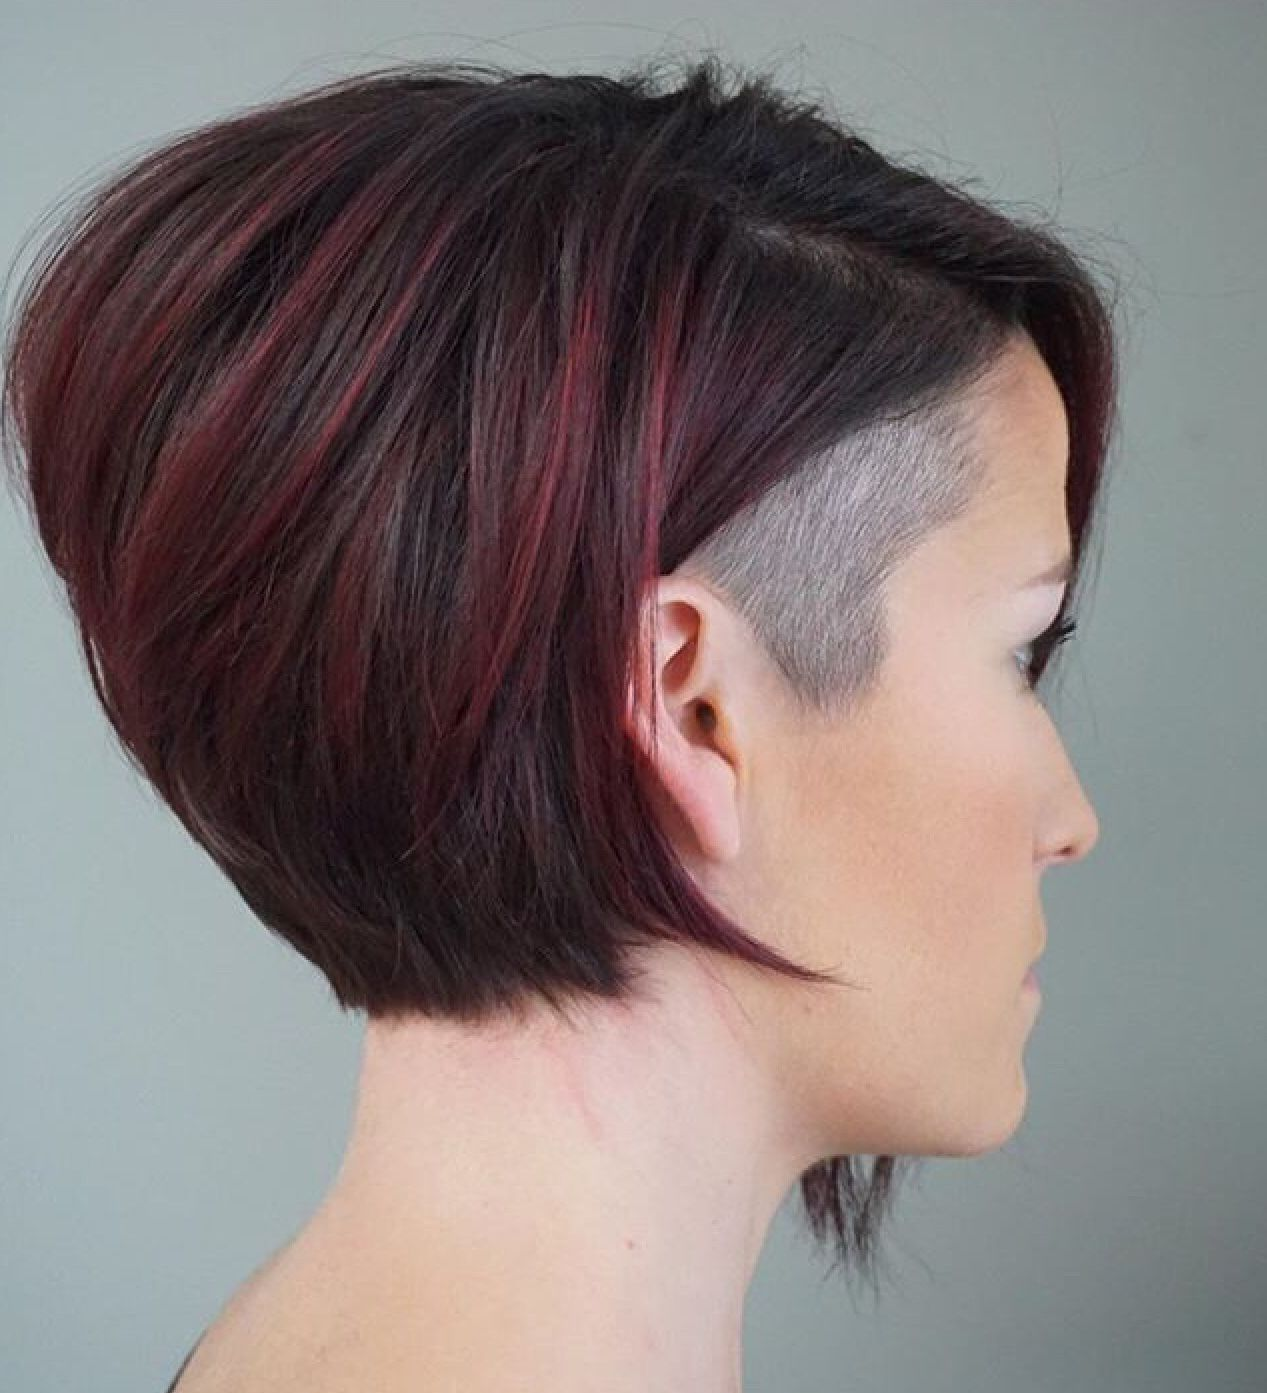 Pin By Josh Oman On Hair Styles Bob Hairstyles Short Hair Styles Short Hair Styles Pixie